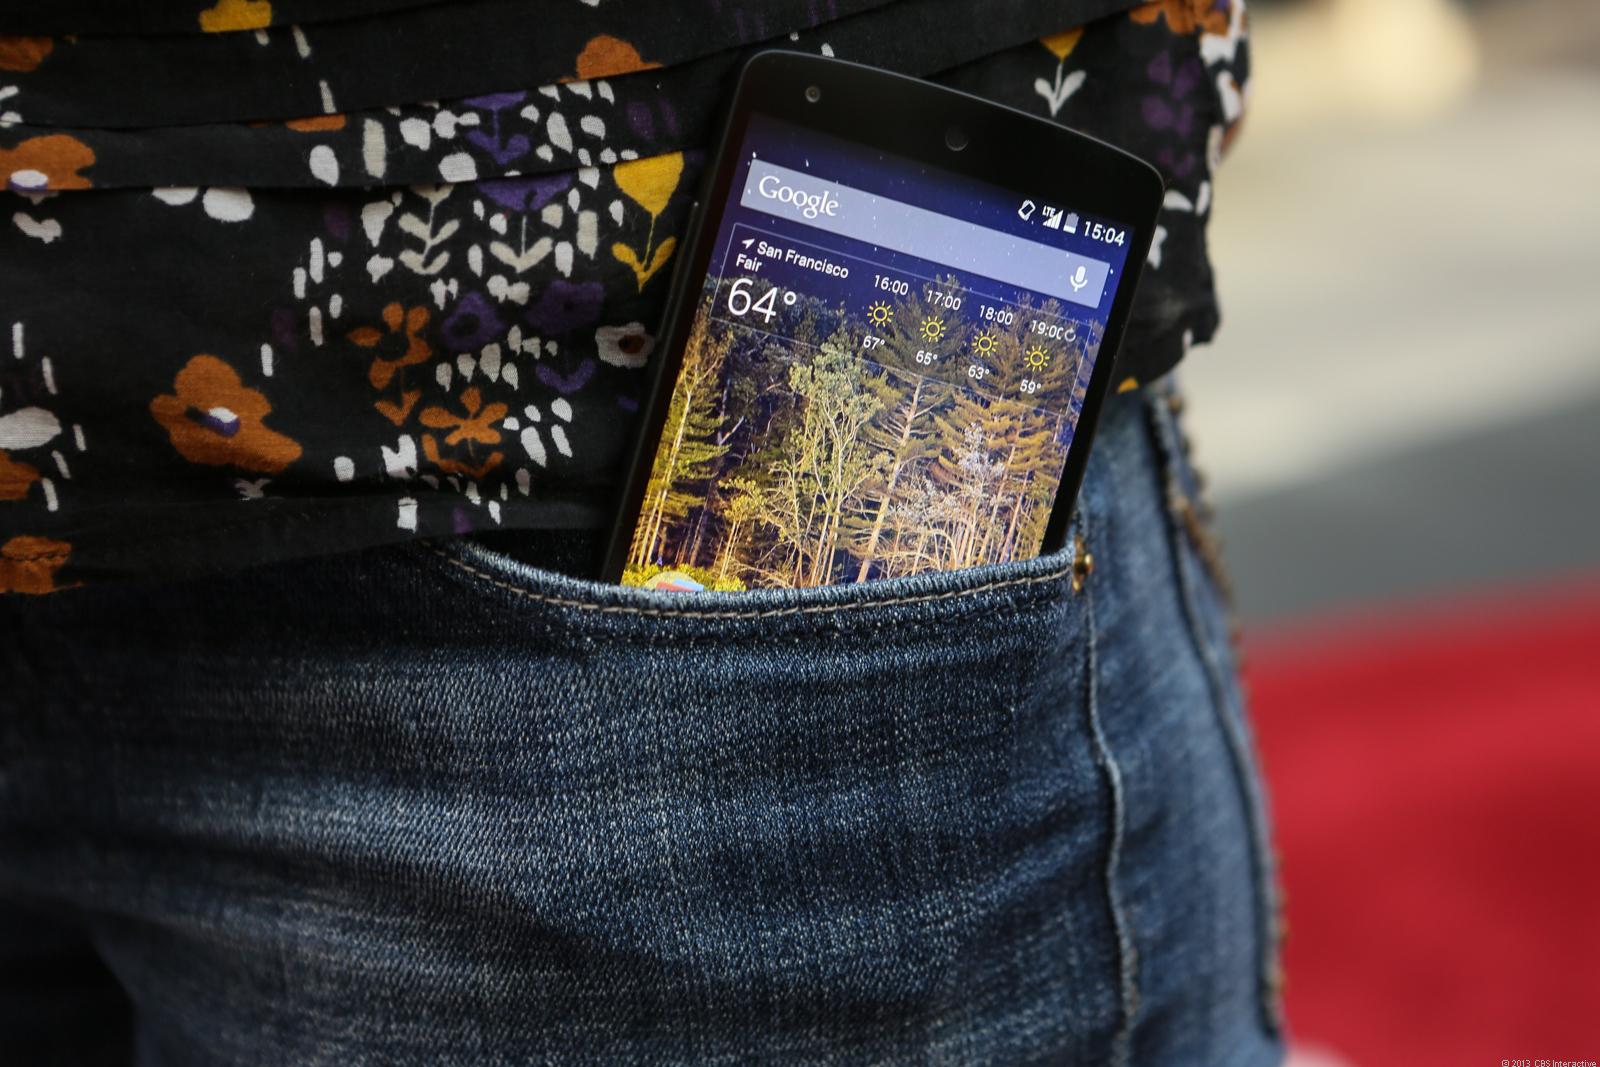 Обзор Google Nexus 5